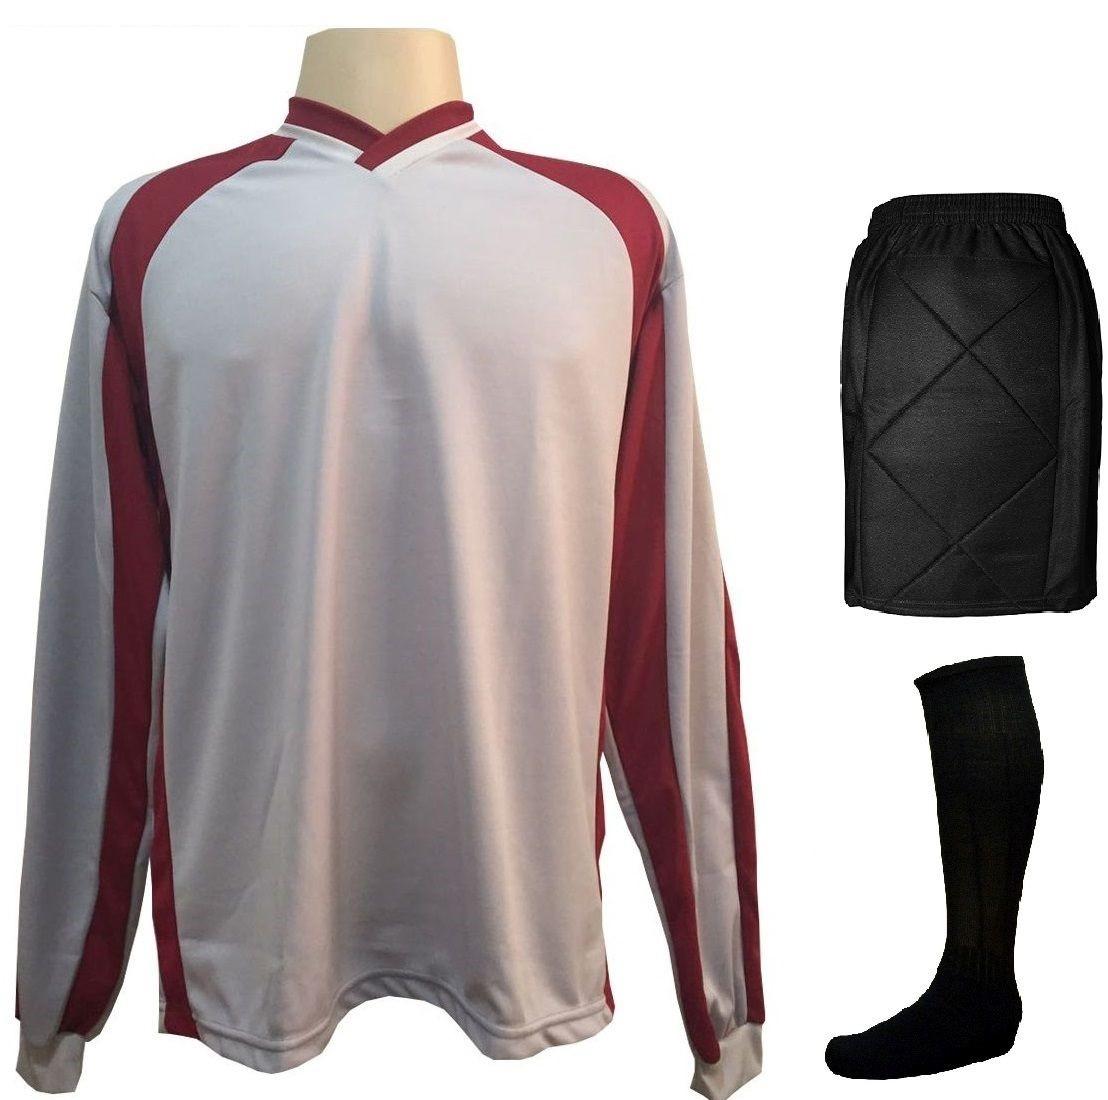 Fardamento Completo modelo Milan 18+1 (18 Camisas Royal/Branco + 18 Calções Madrid Branco + 18 Pares de Meiões Brancos + 1 Conjunto de Goleiro) + Brindes